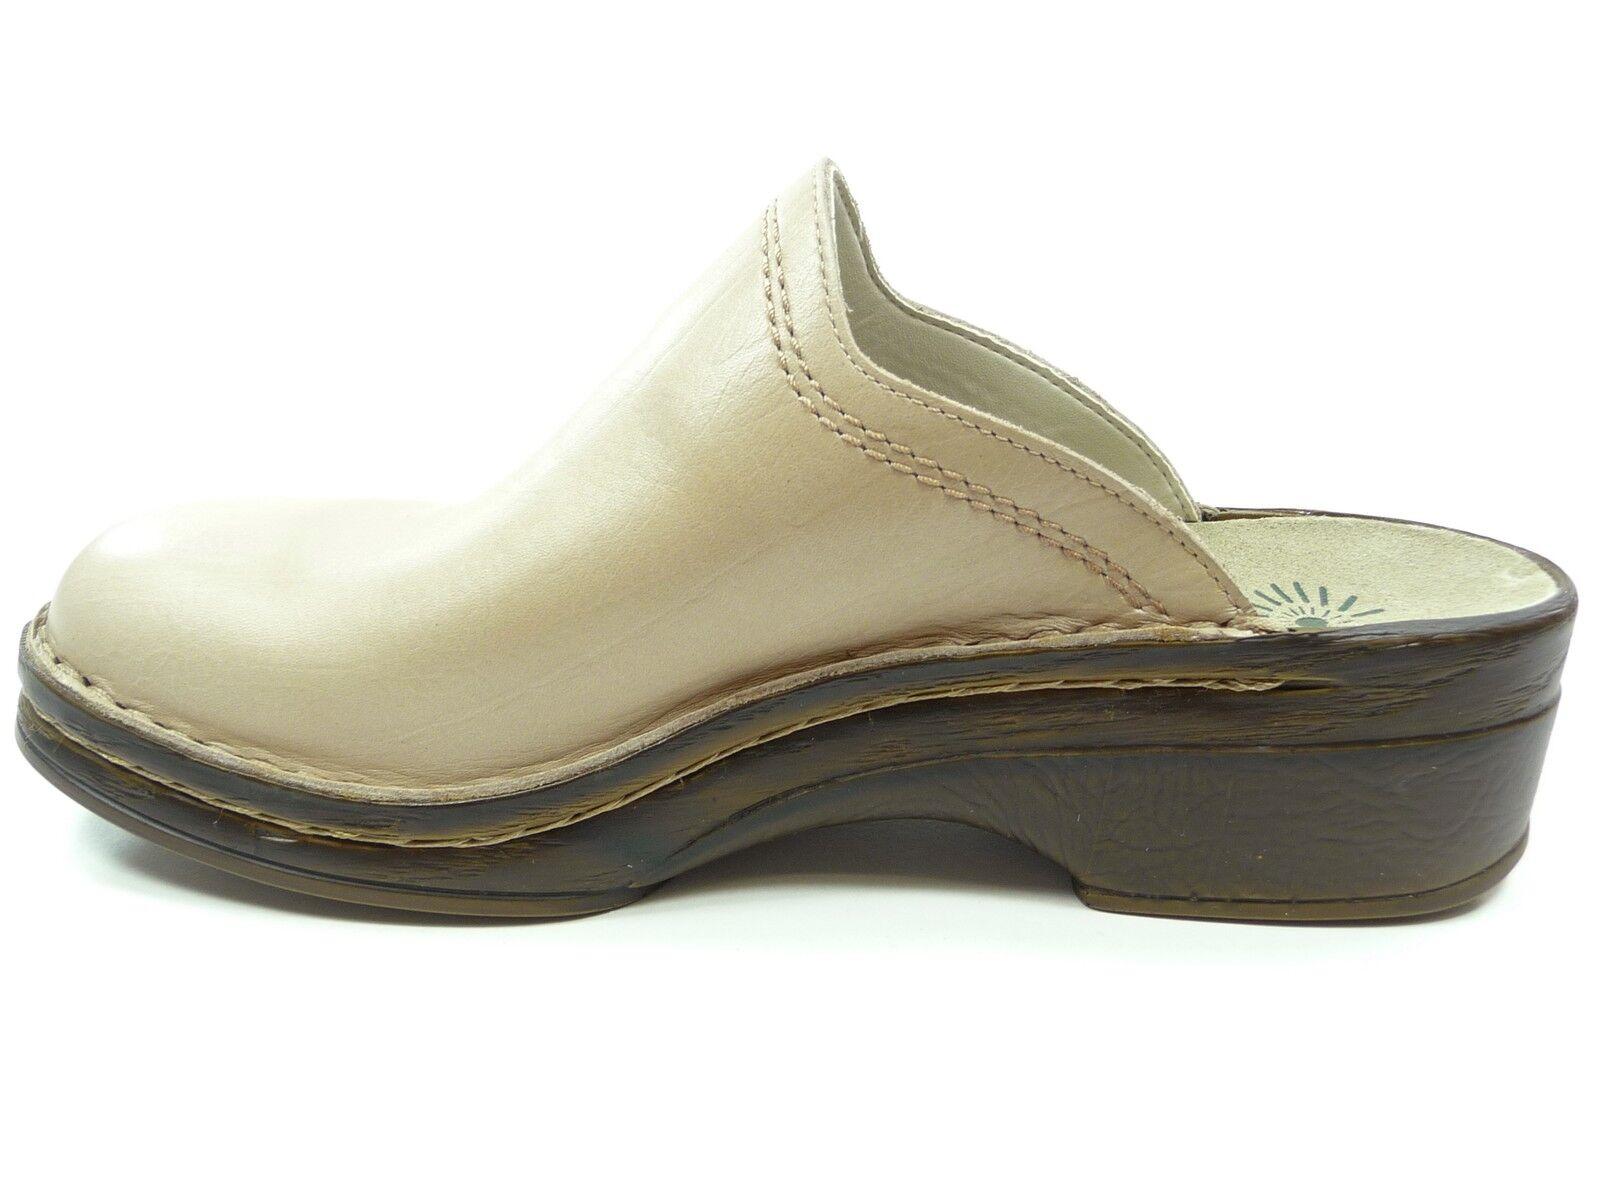 HELIX Schuhe Herrenschuhe Pantoletten Stein Clogs in Beige Stein Pantoletten 52011-32 b0ccd1